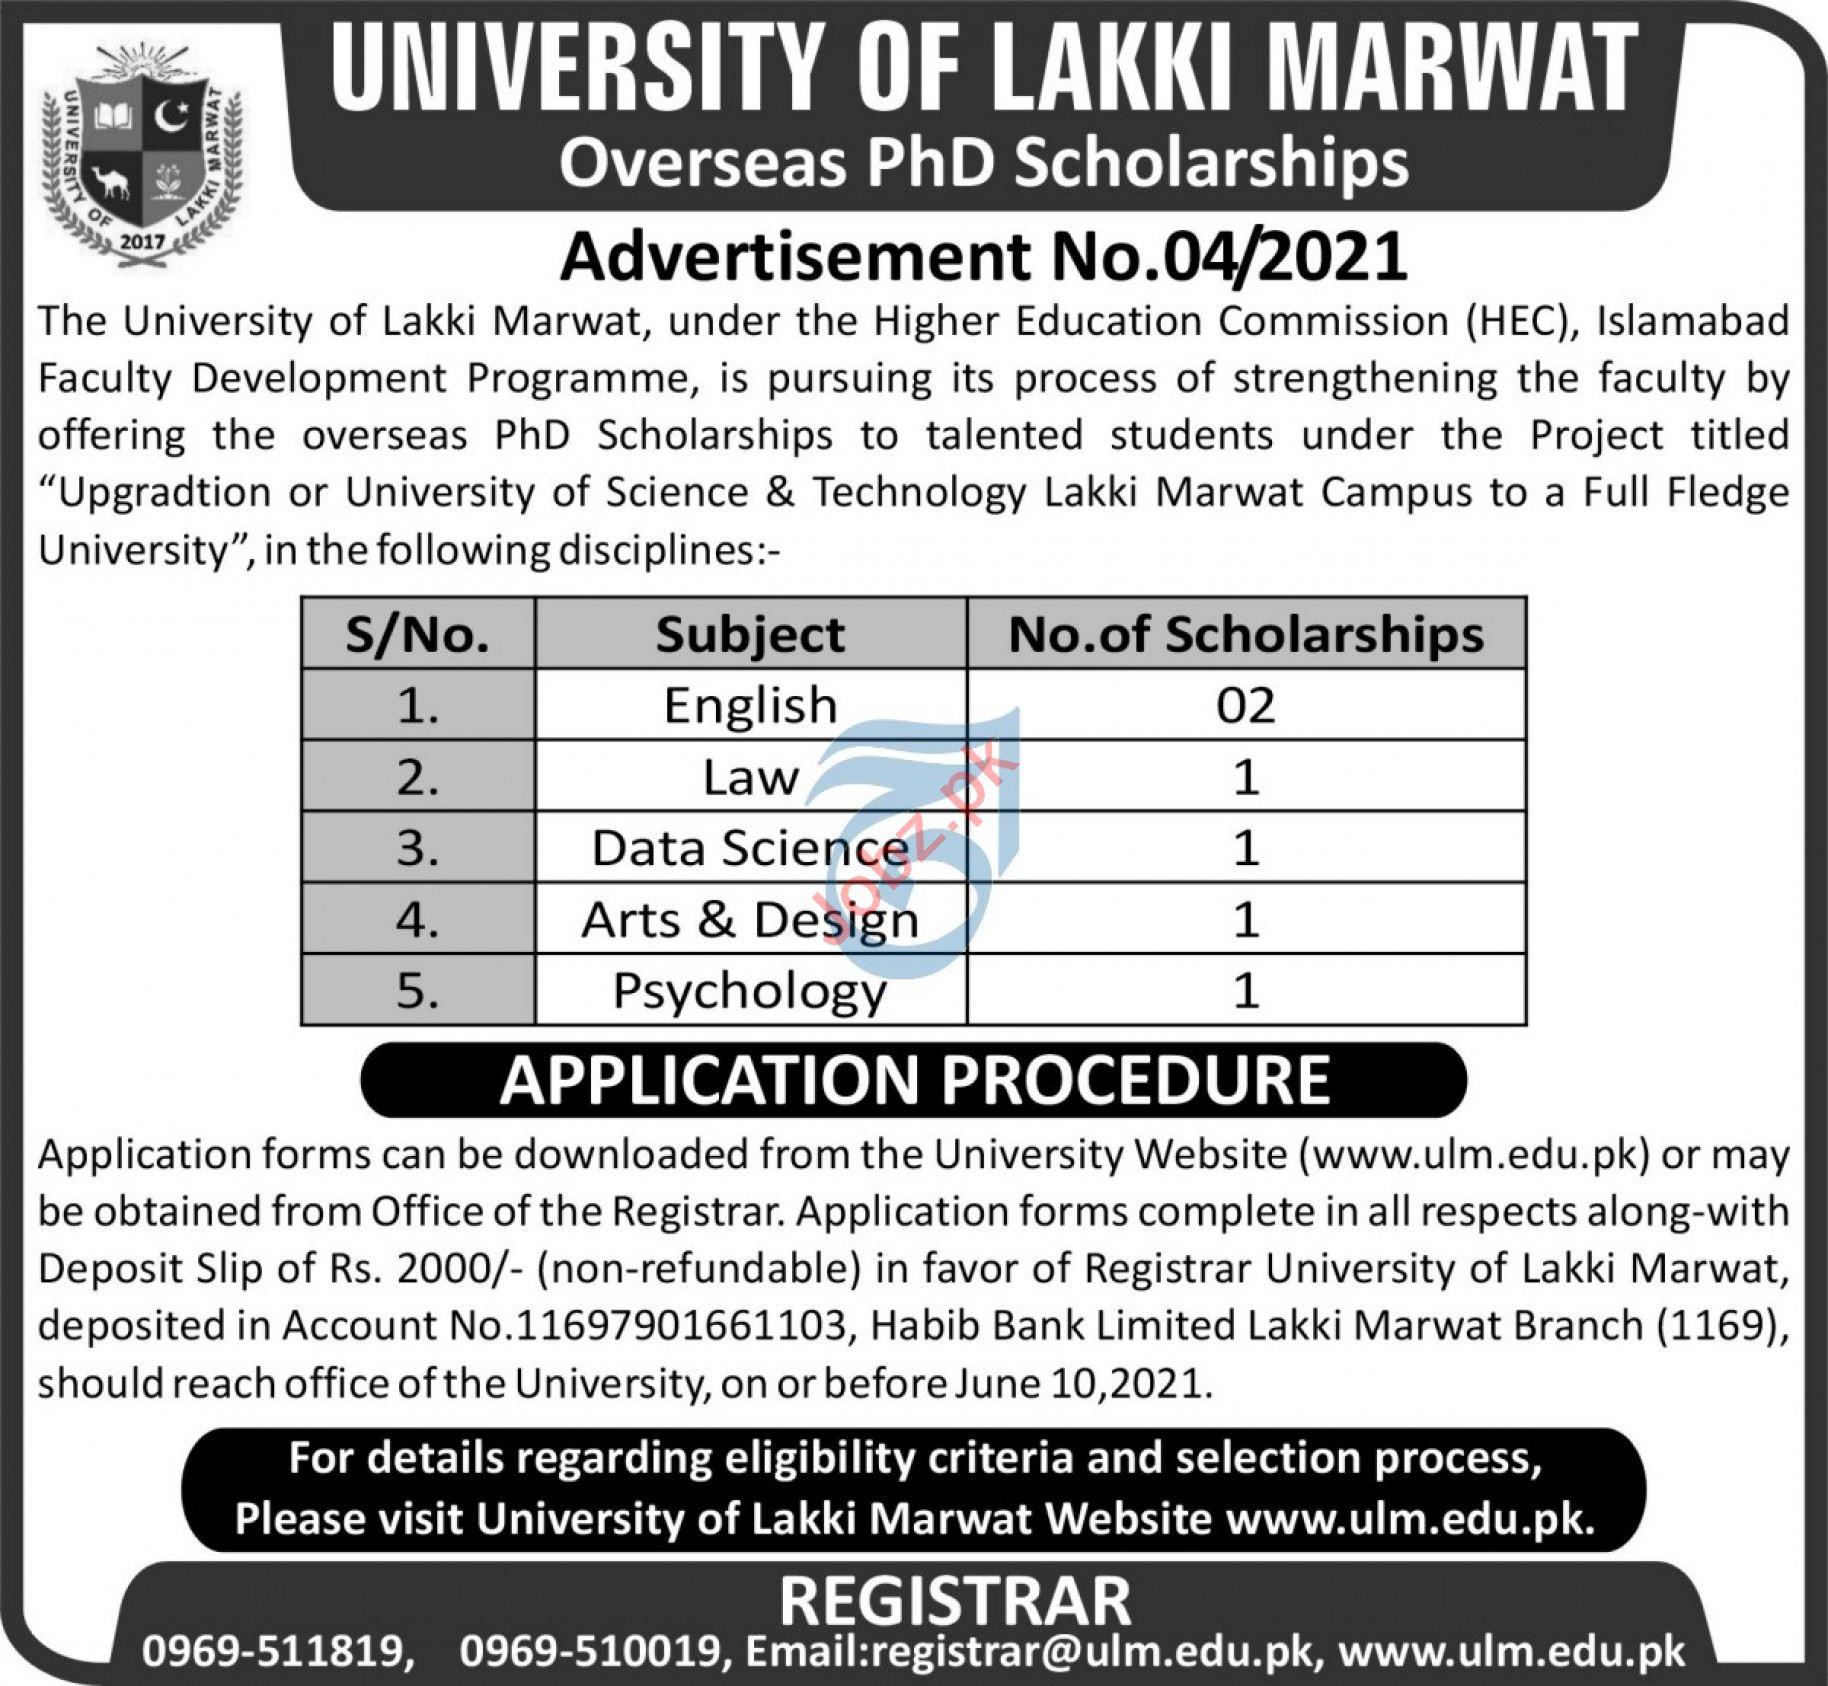 University of Lakki Marwat Overseas PhD Scholarships 2021